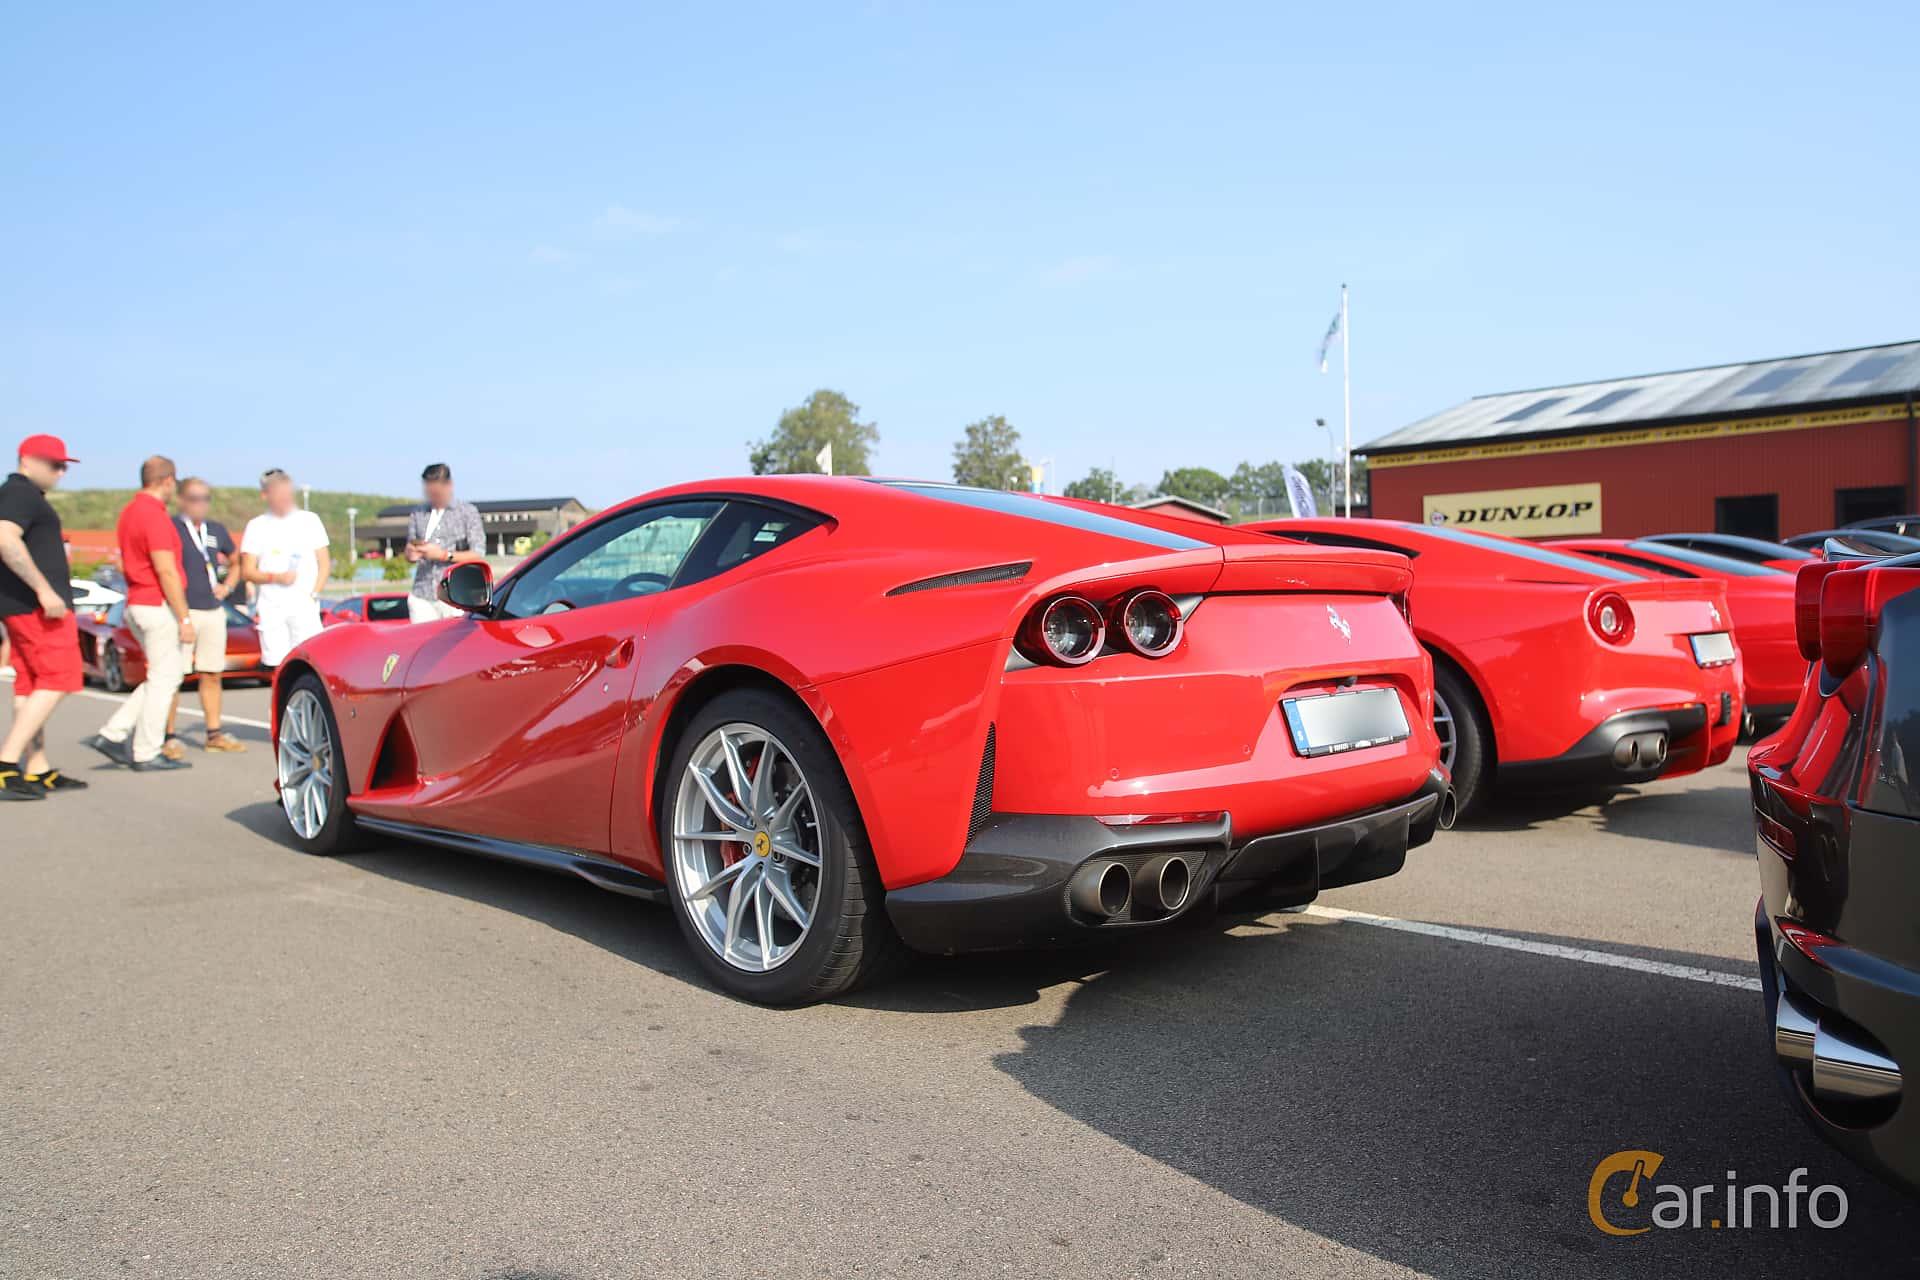 Ferrari 812 Superfast 6.5 V12 DCT, 800hp, 2018 at Autoropa Racing day Knutstorp 2019